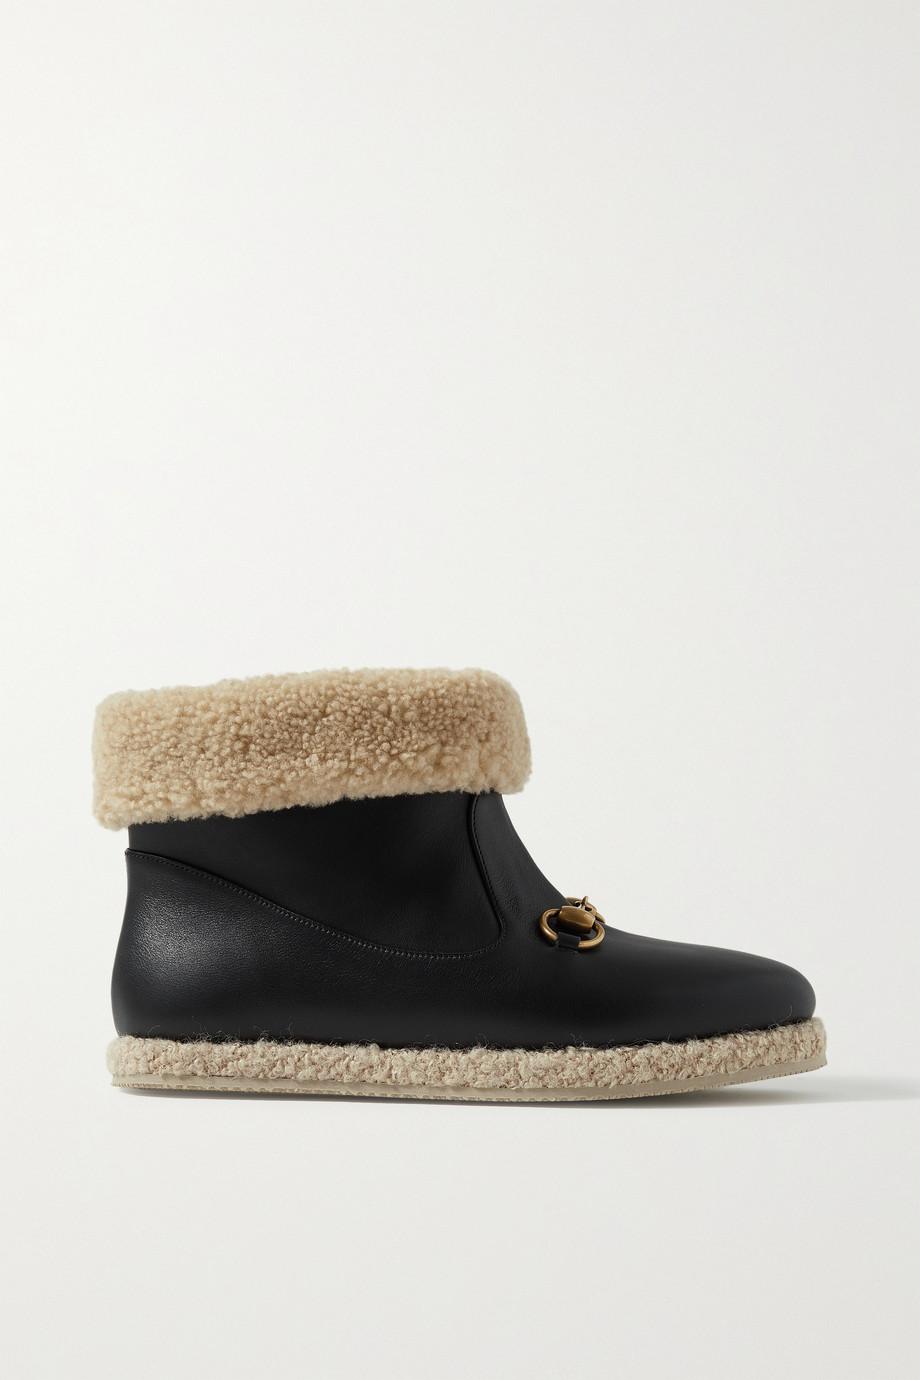 Gucci Fria Ankle Boots aus Leder mit Besatz aus Shearling-Imitat und Horsebit-Detail